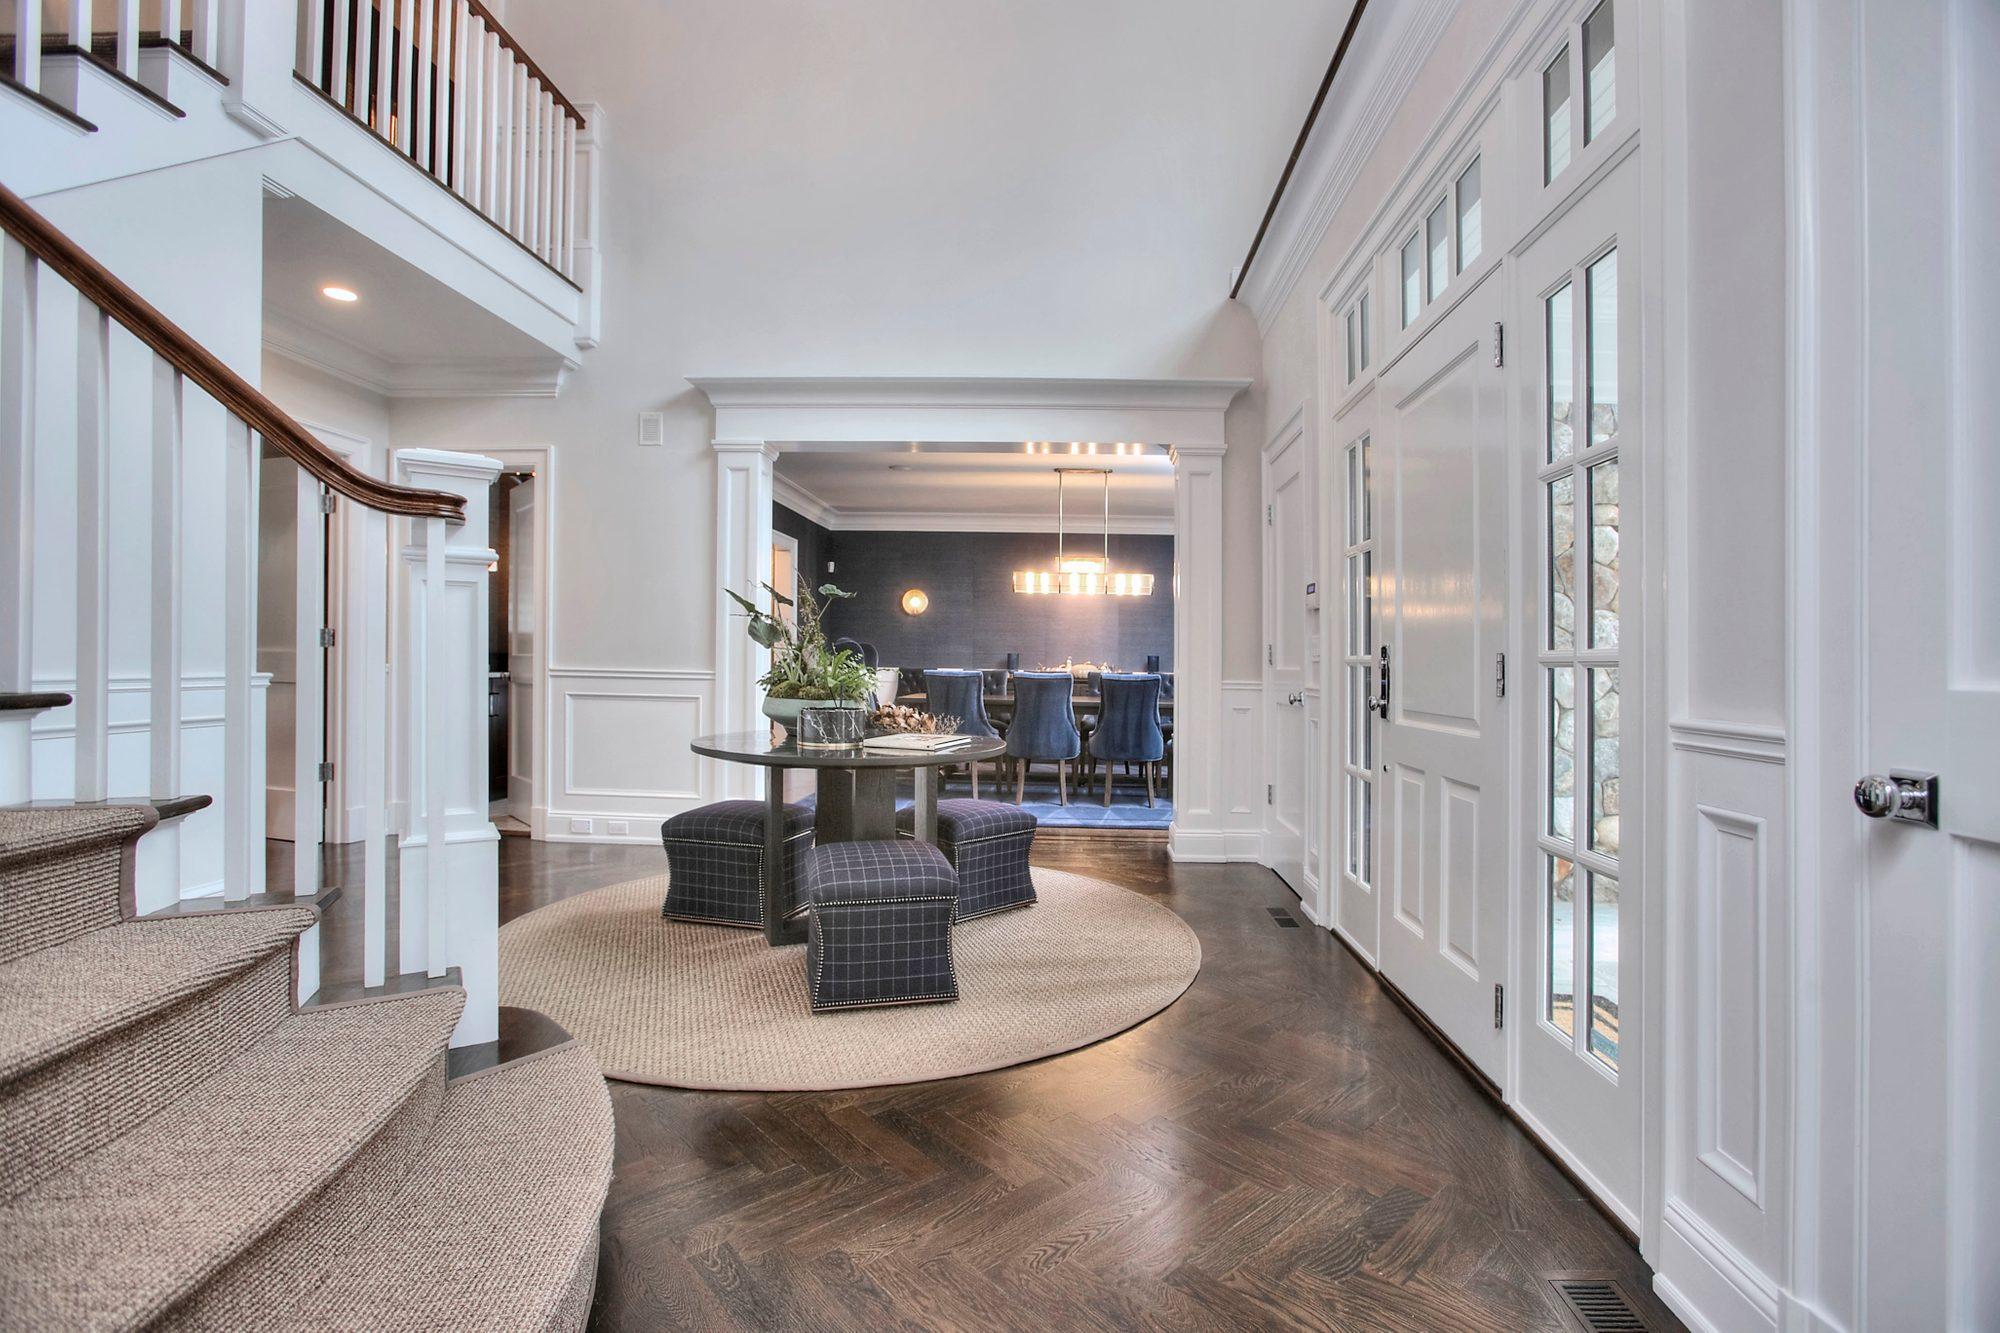 beautiful custom home with dark brown hardwood floors installed with a herringbone pattern.